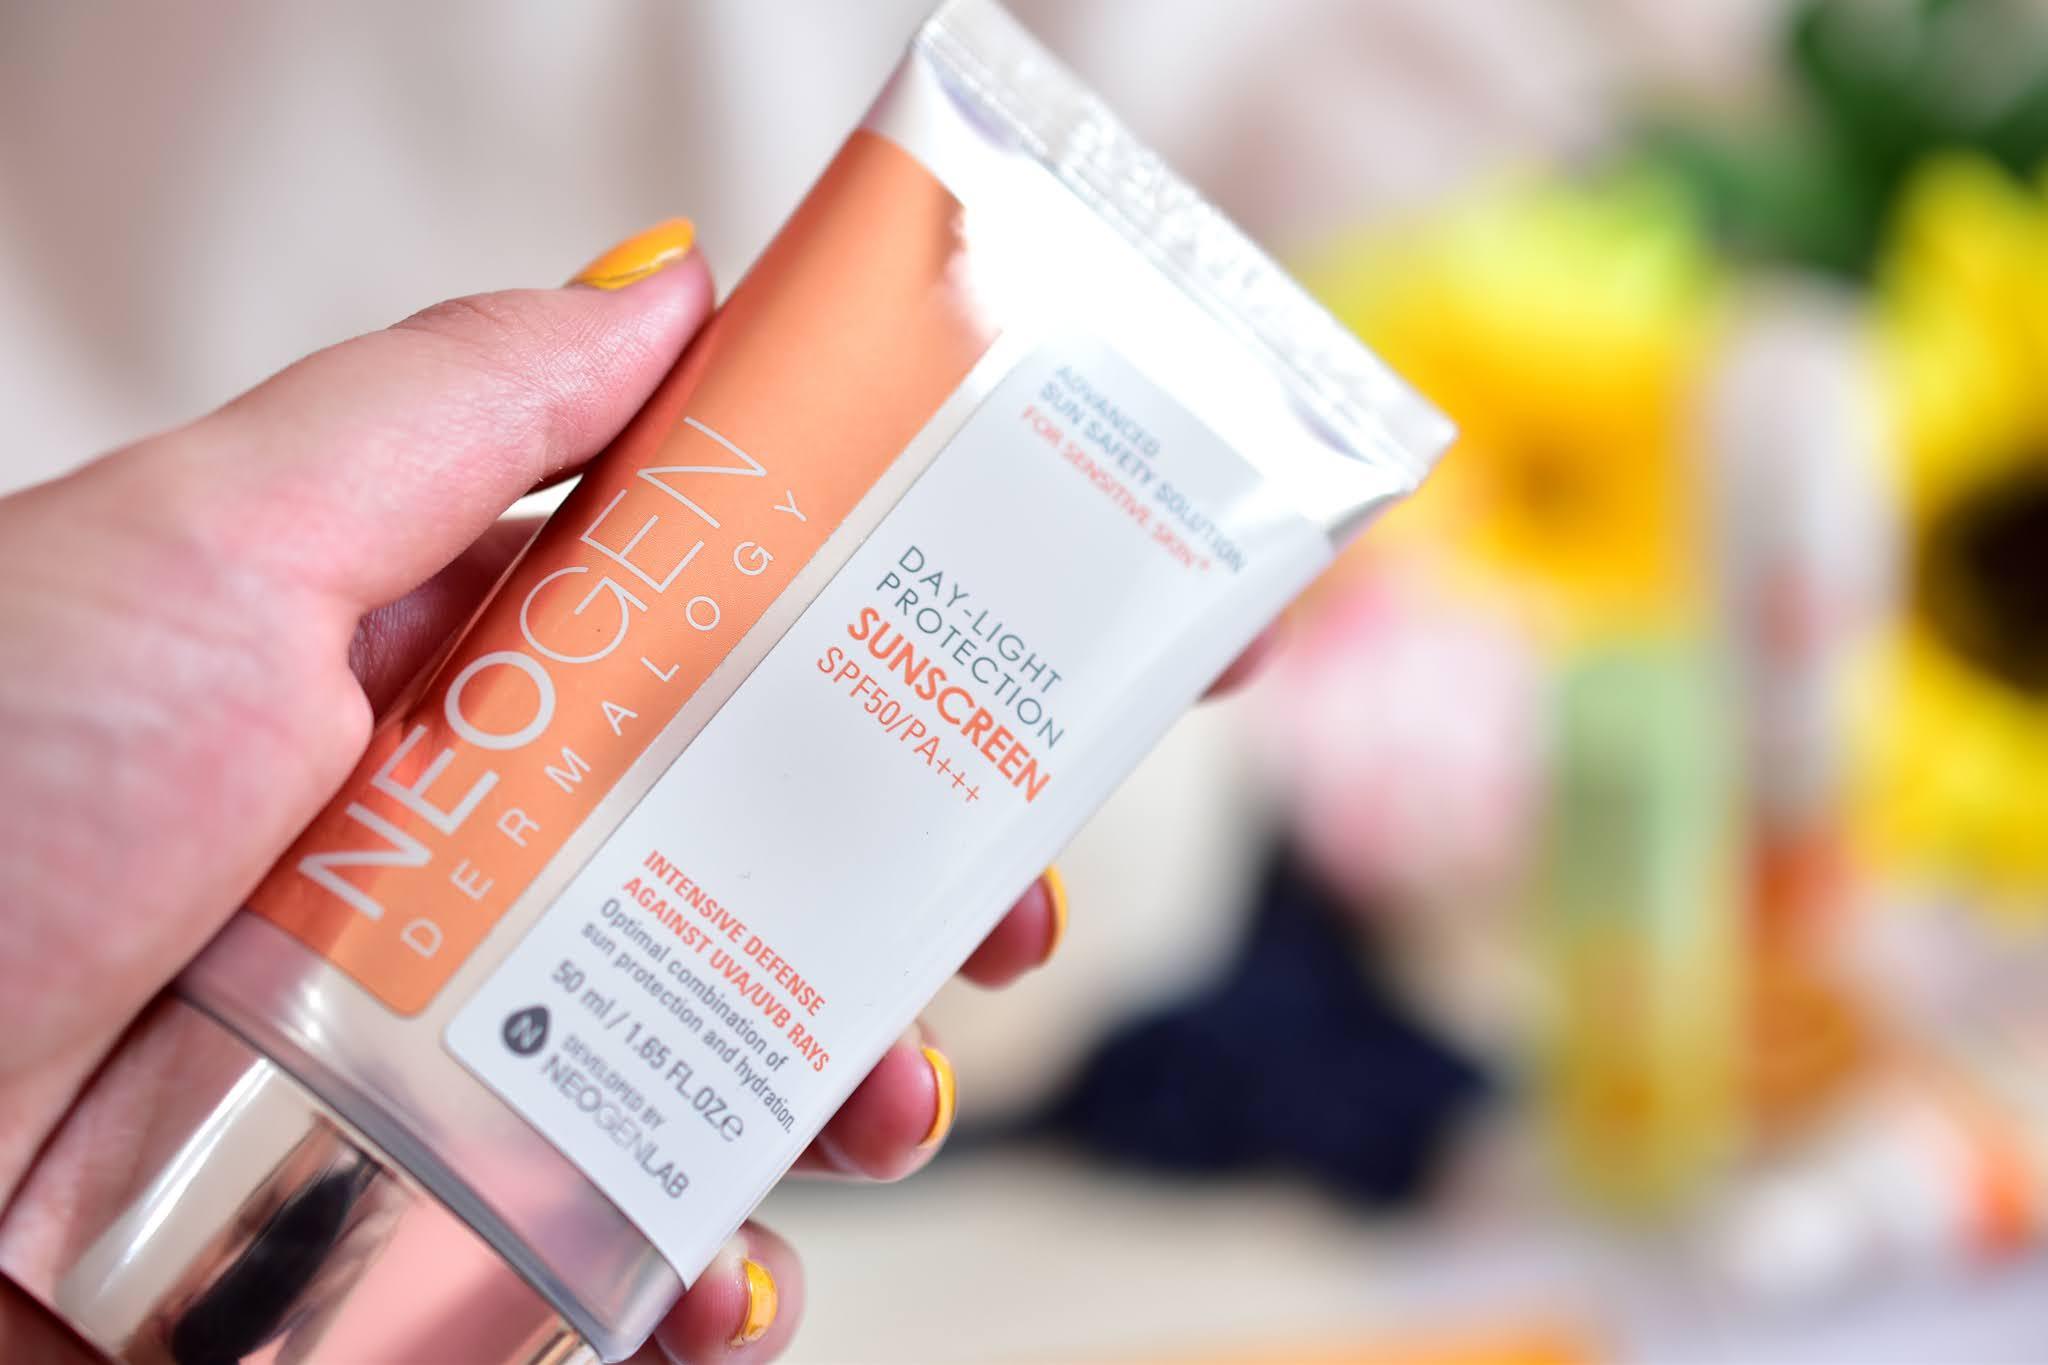 Neogen Day Light protection Sunscreen